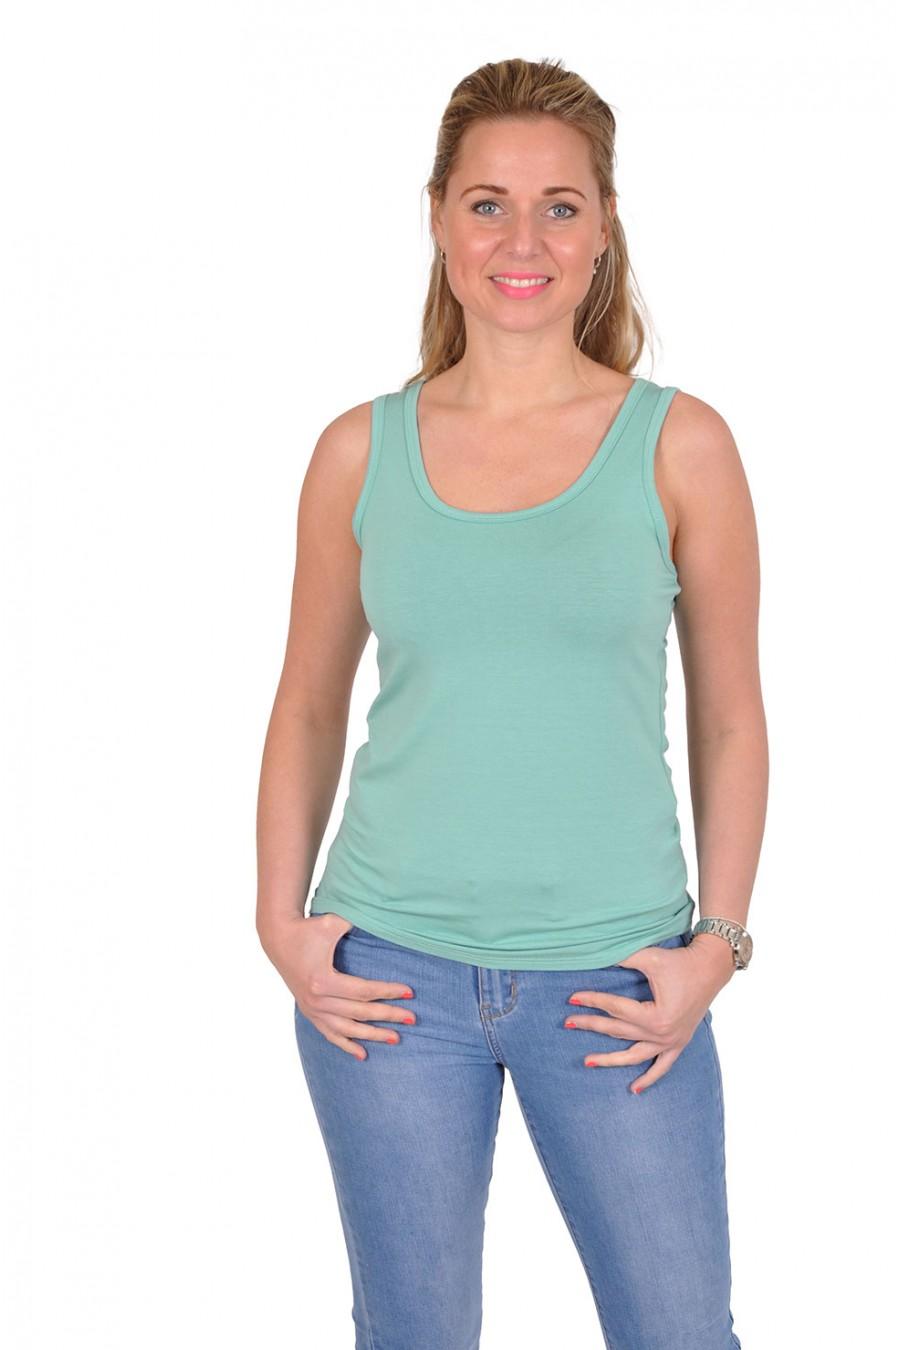 Basic topje want-it turquoise Italia Moda